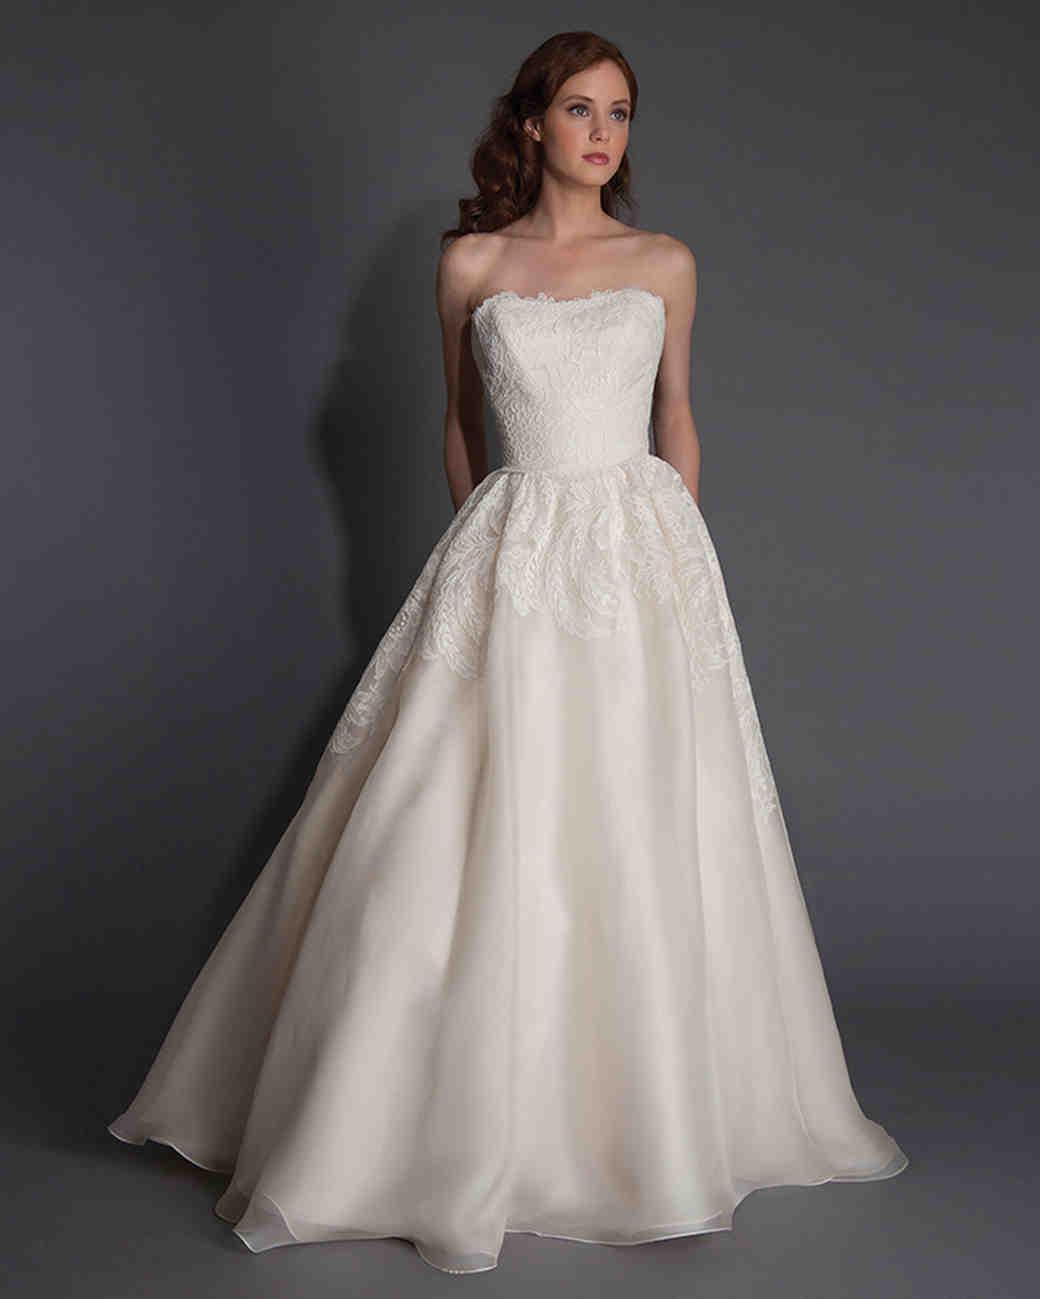 50-states-wedding-dresses-arkansas-mod-trousseau-0615.jpg